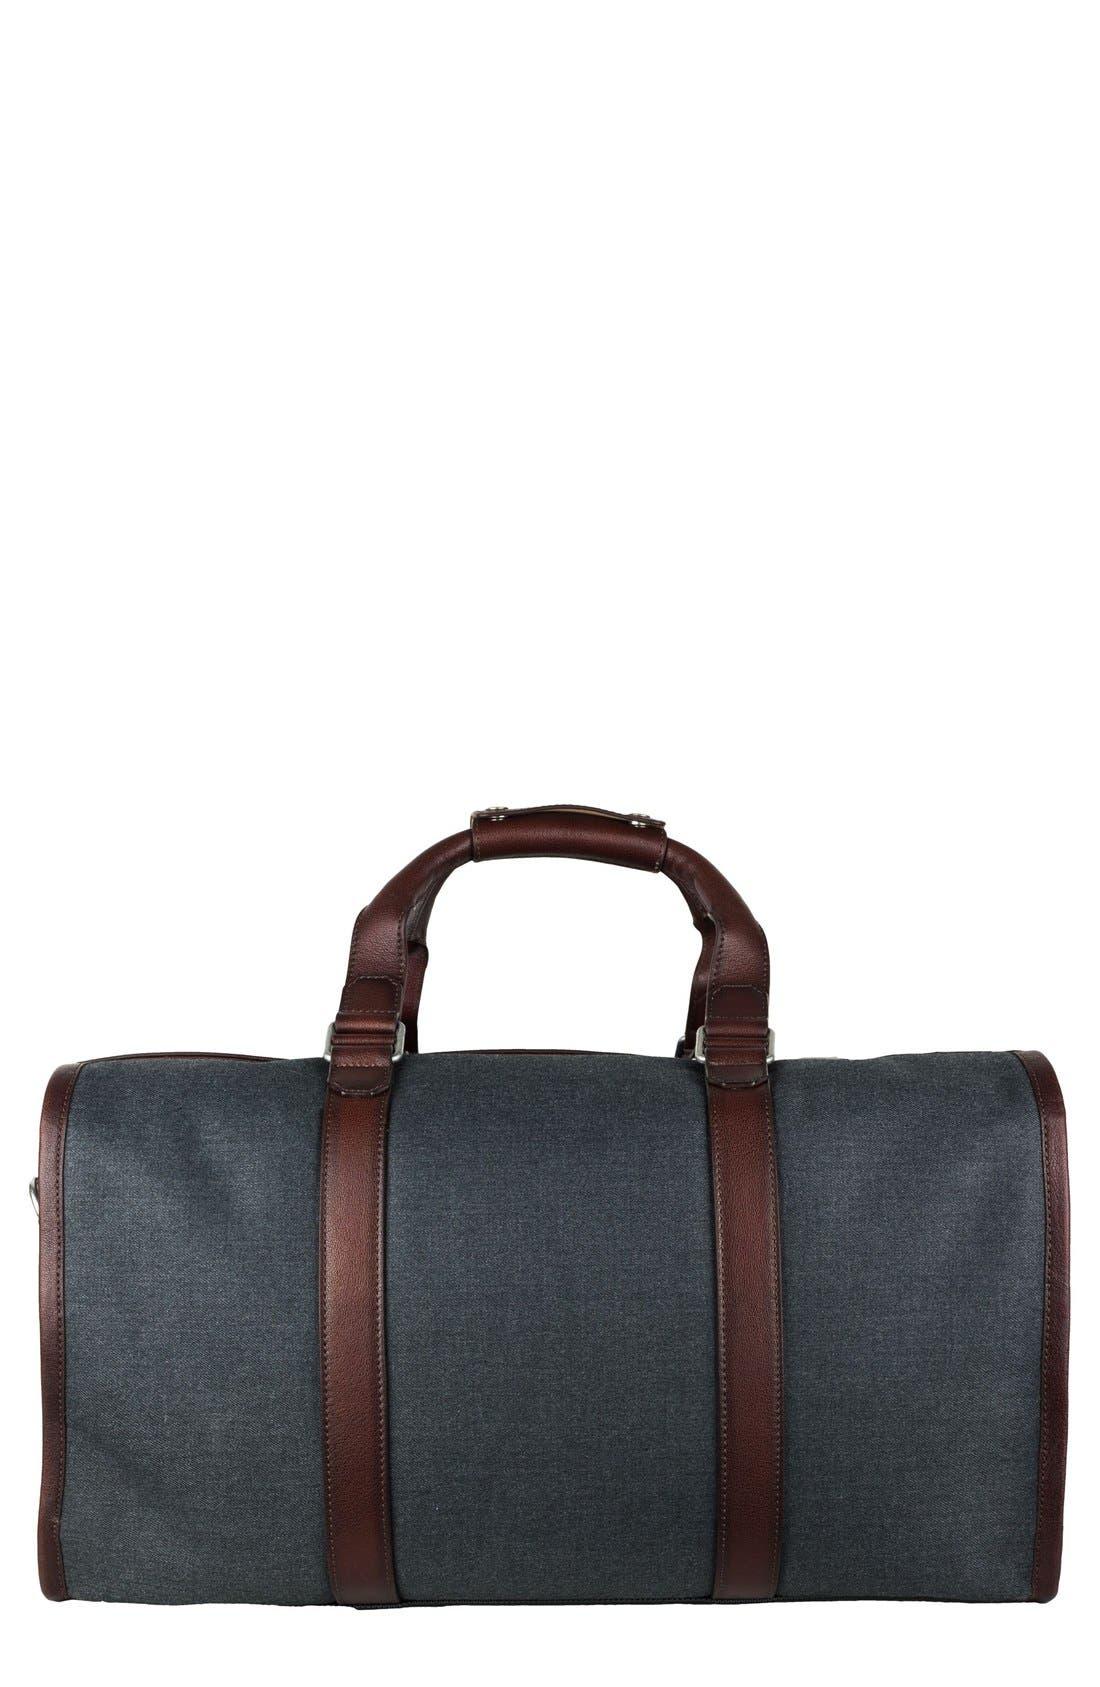 'Grafton' Duffel Bag,                             Main thumbnail 1, color,                             Grey